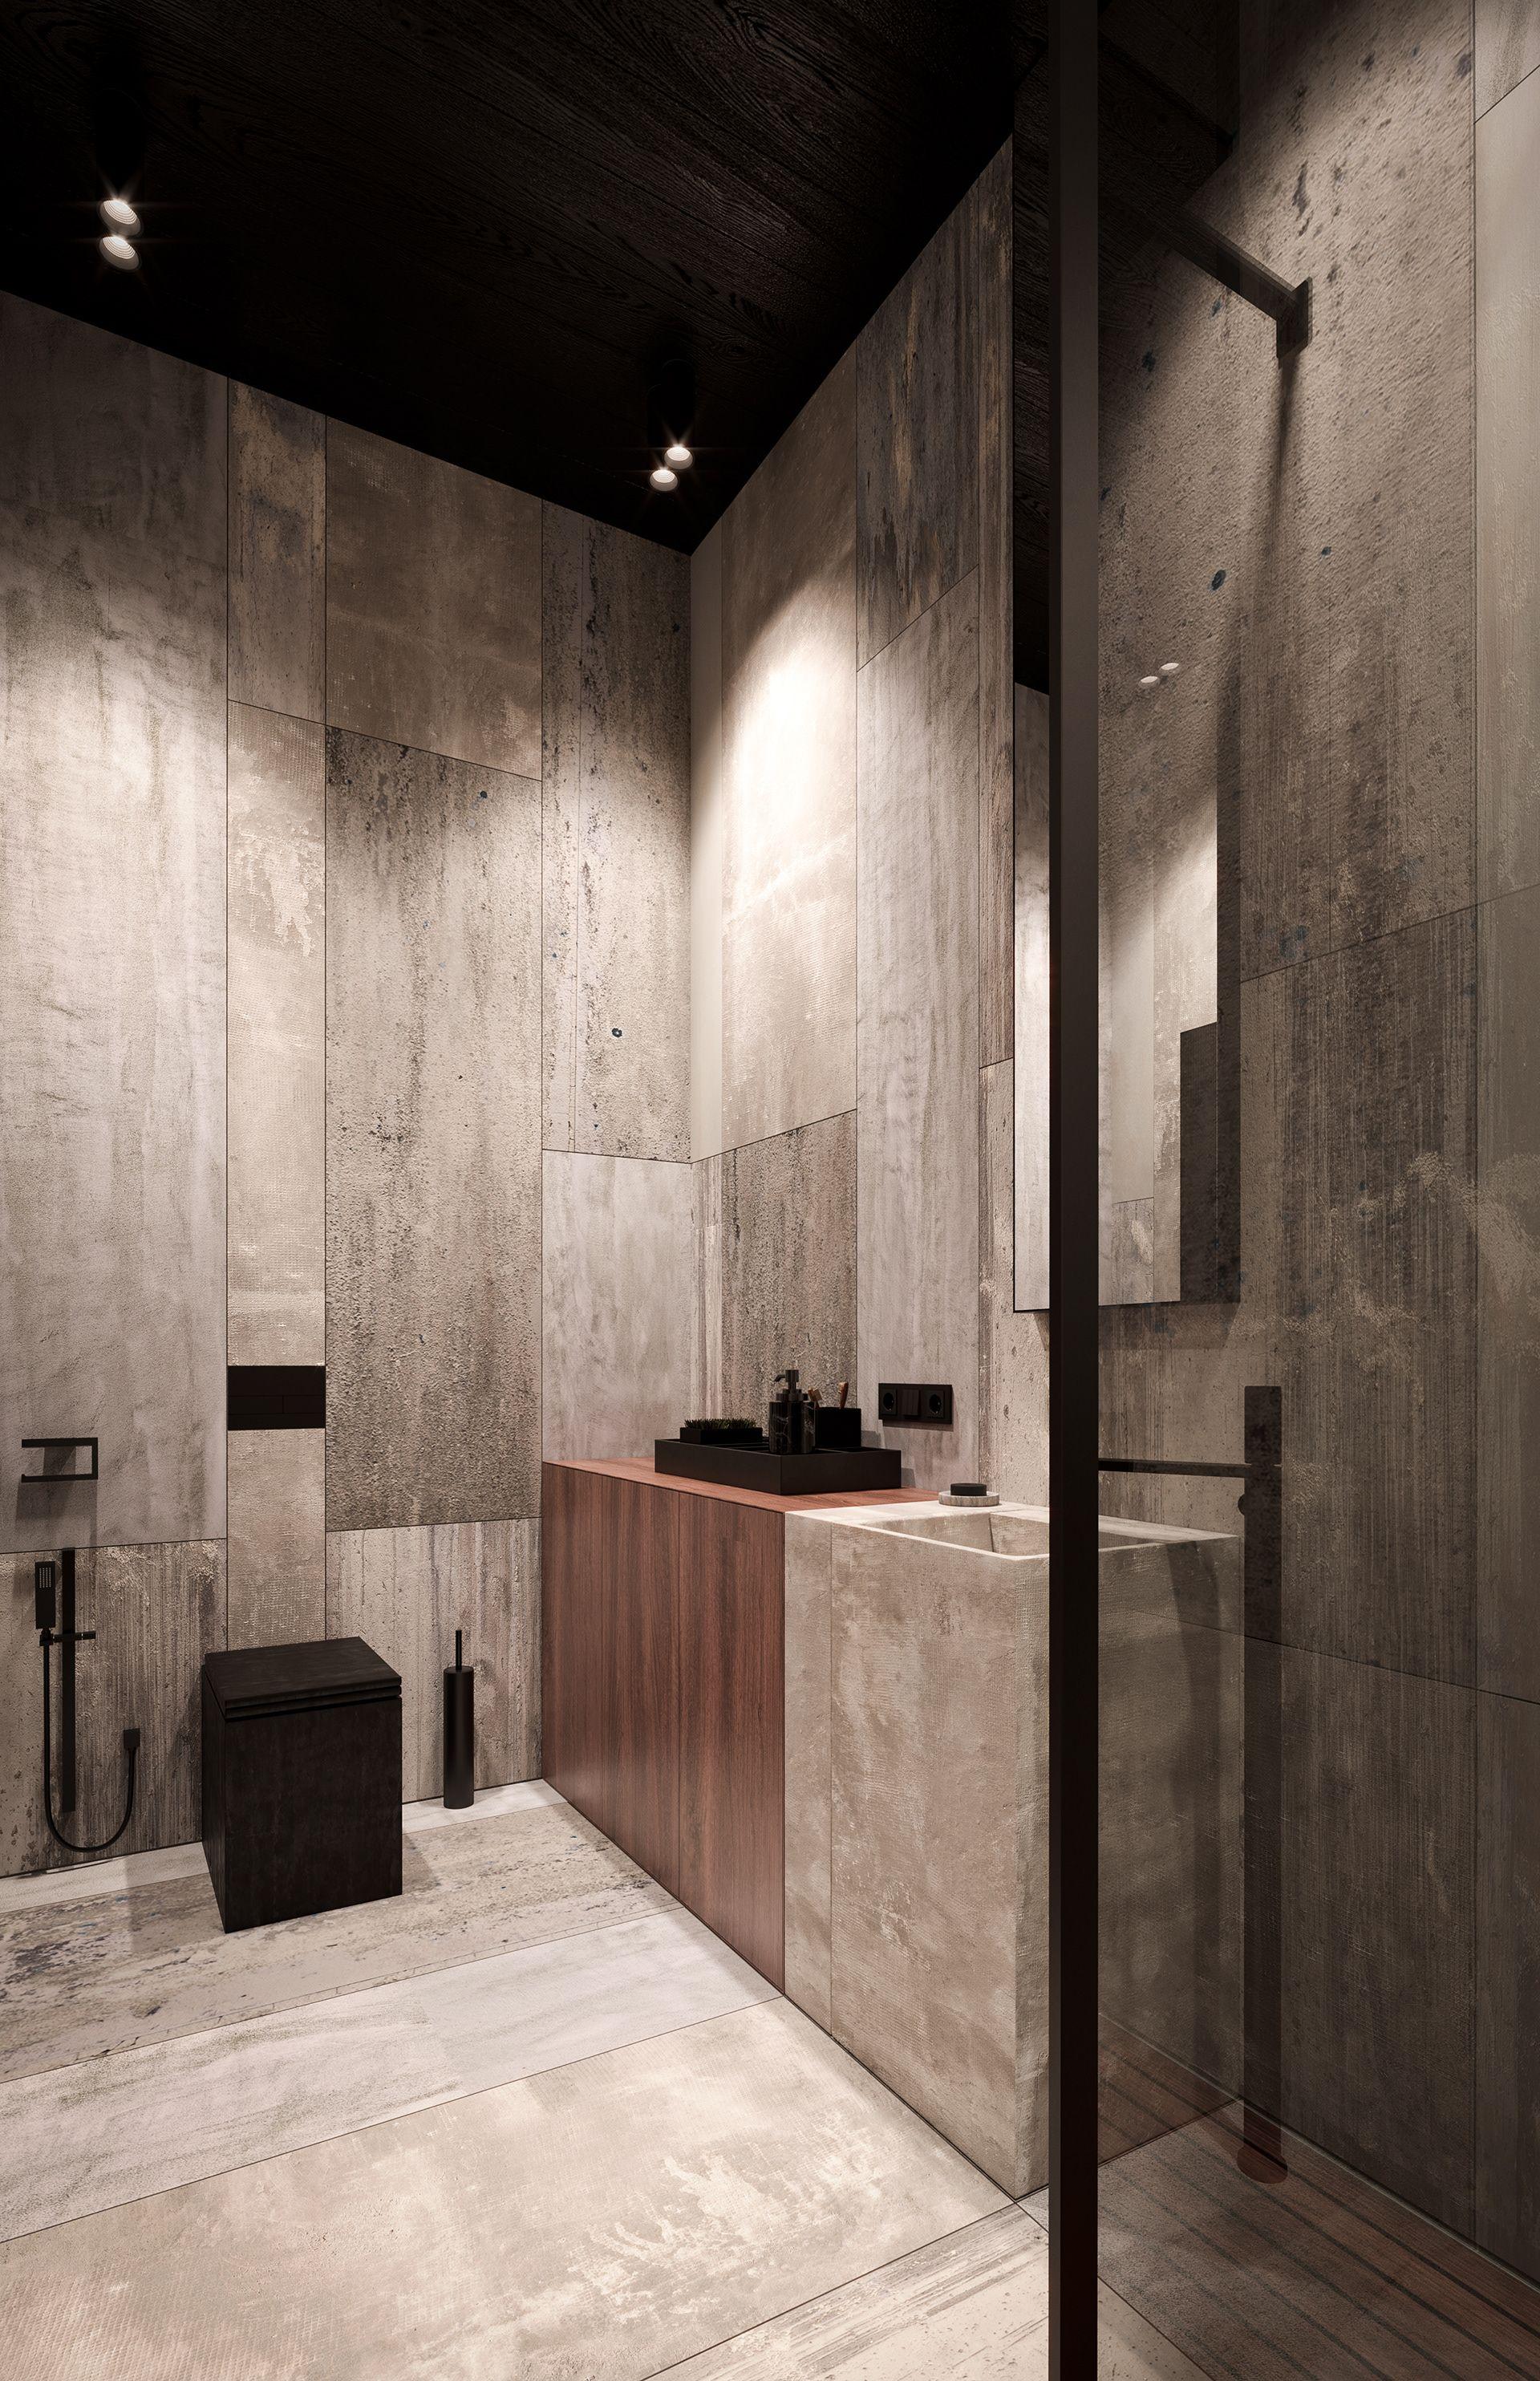 ROMA HOUSE interior buro511 on Behance (с изображениями